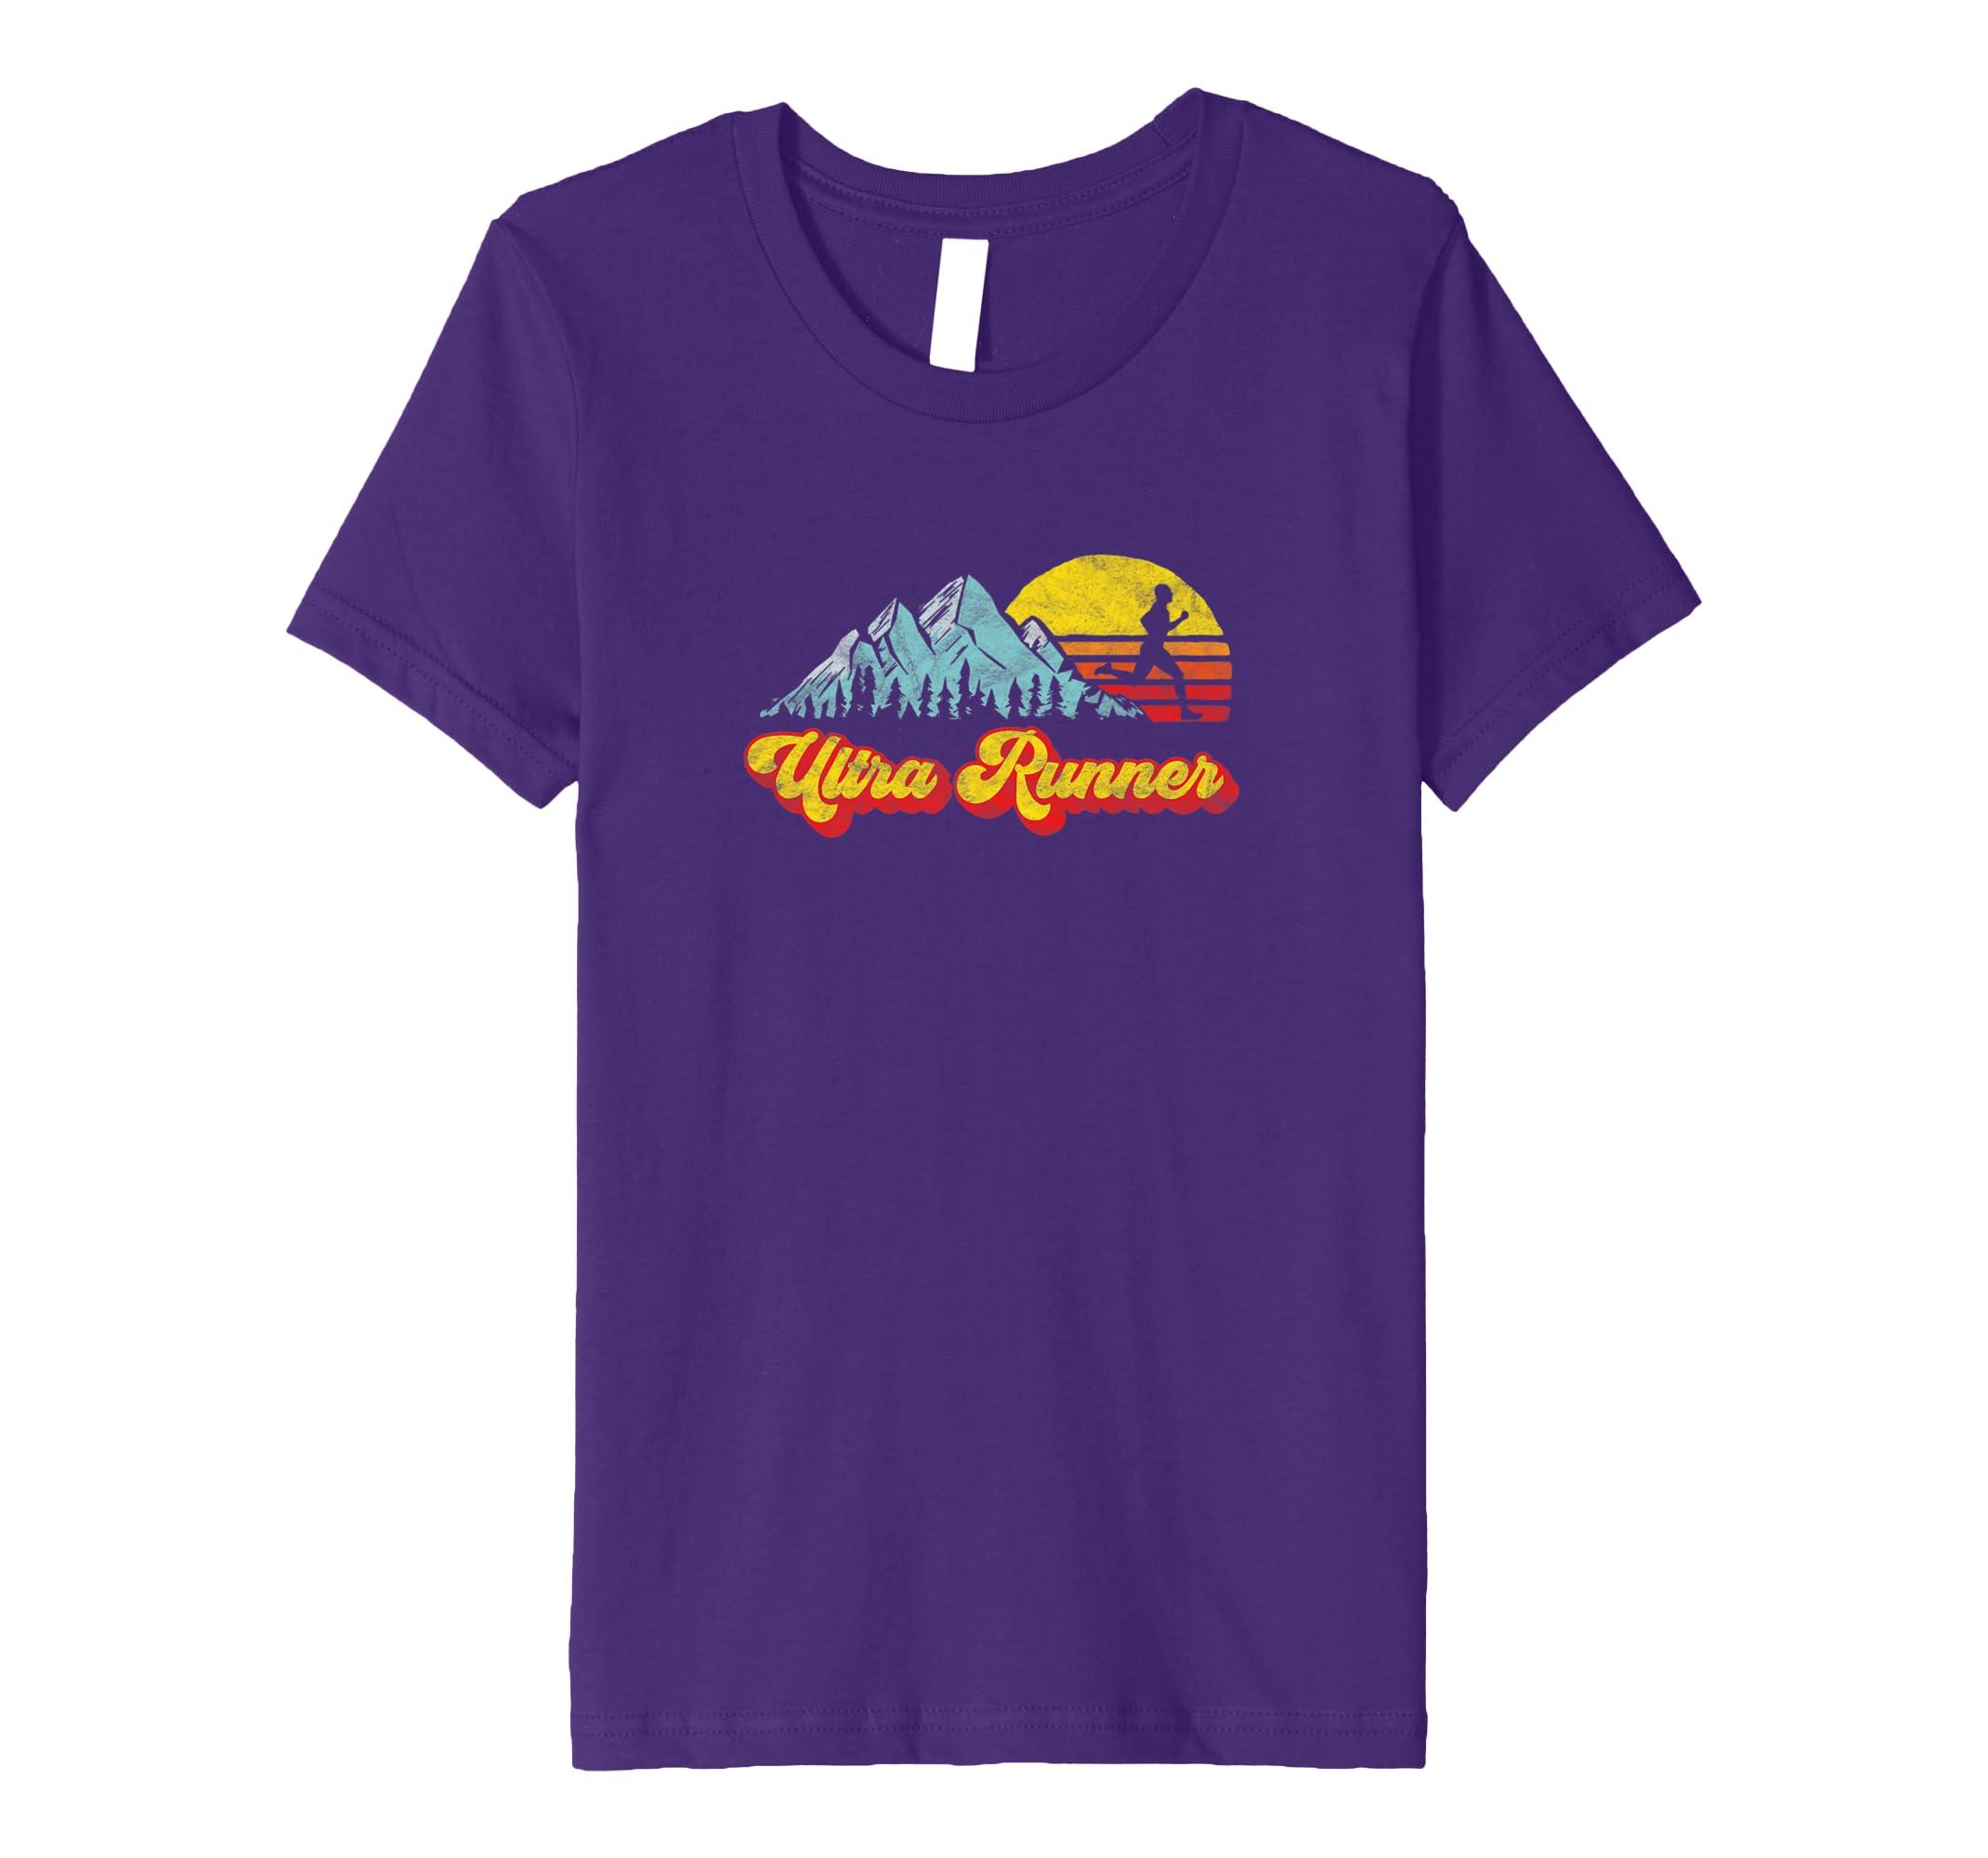 17883e03a71c Amazon.com  Ultra Runner - Retro Style Vintage Trail Running T-Shirt   Clothing